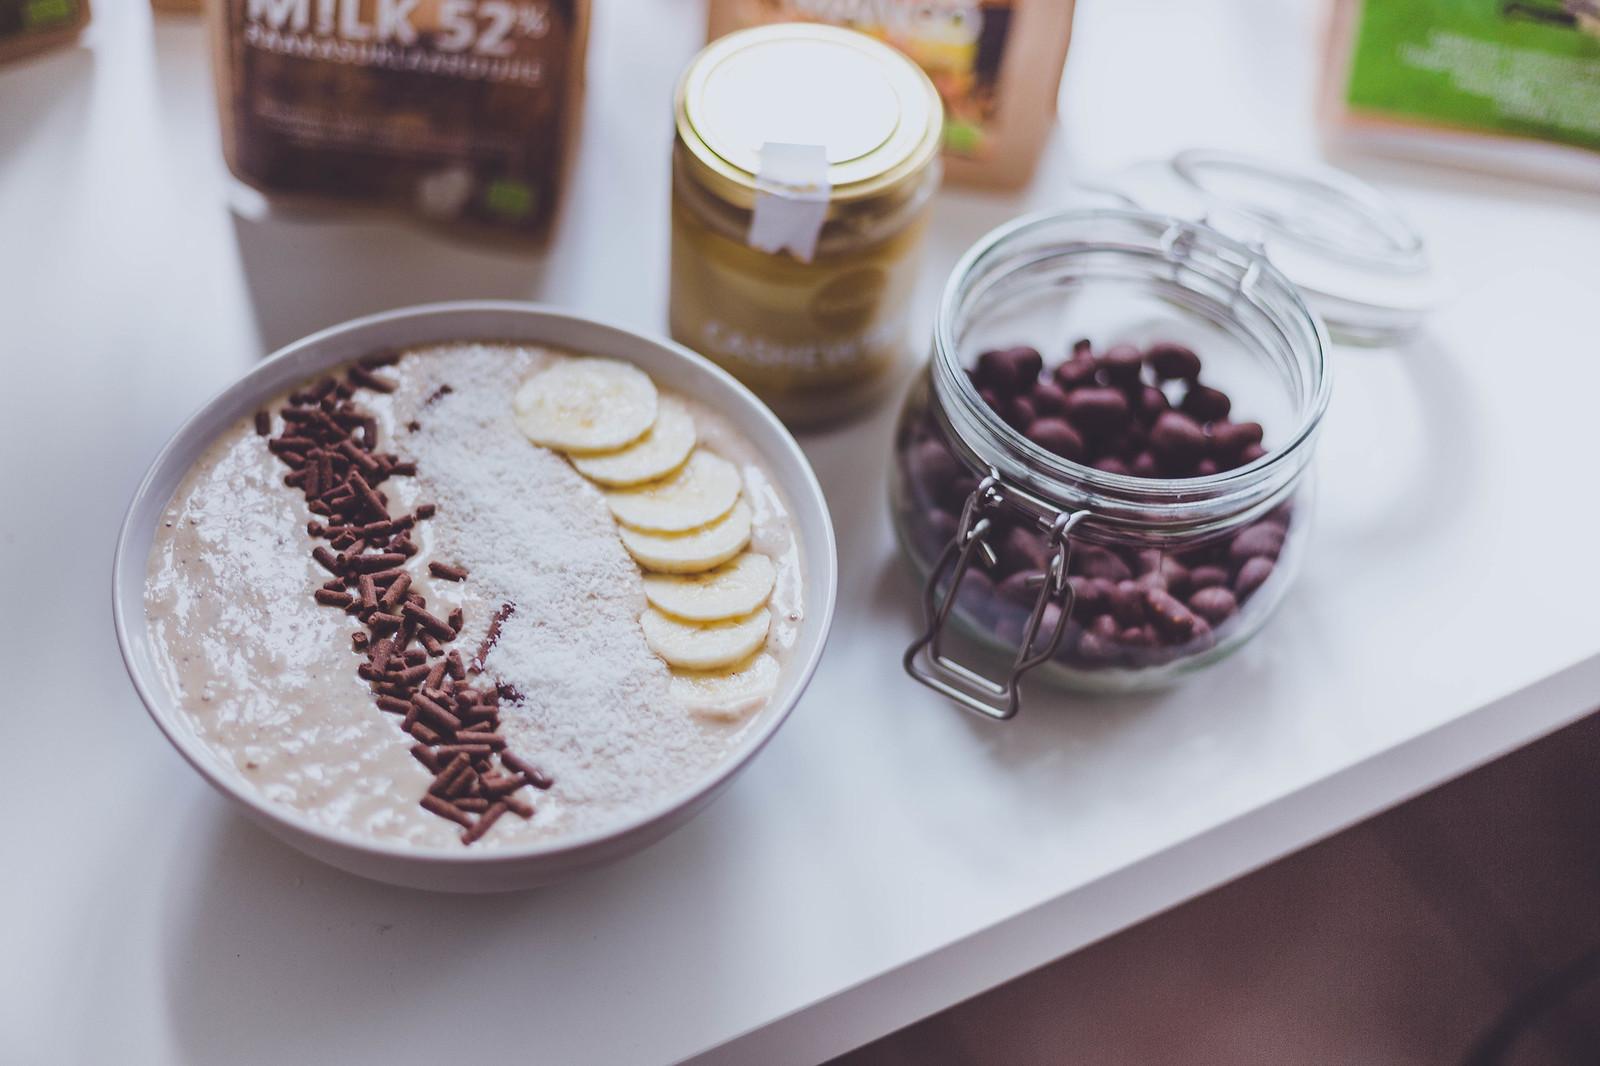 bananza smoothie bowl